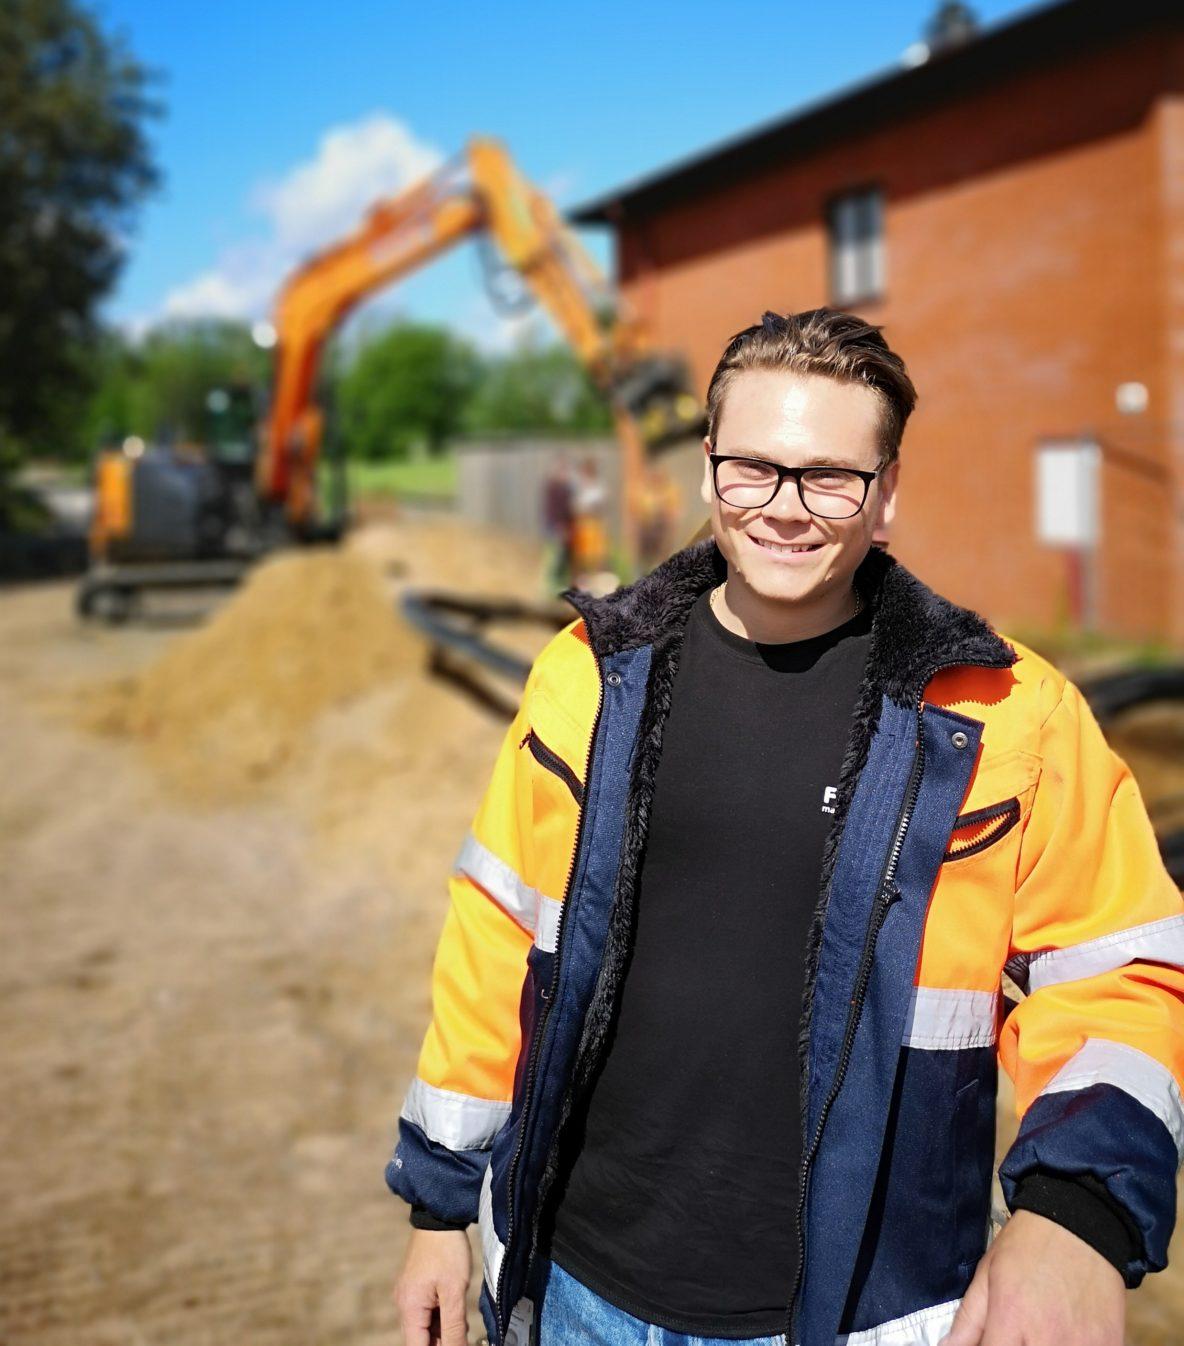 Falks Markentreprenad Fredrik Grönberg